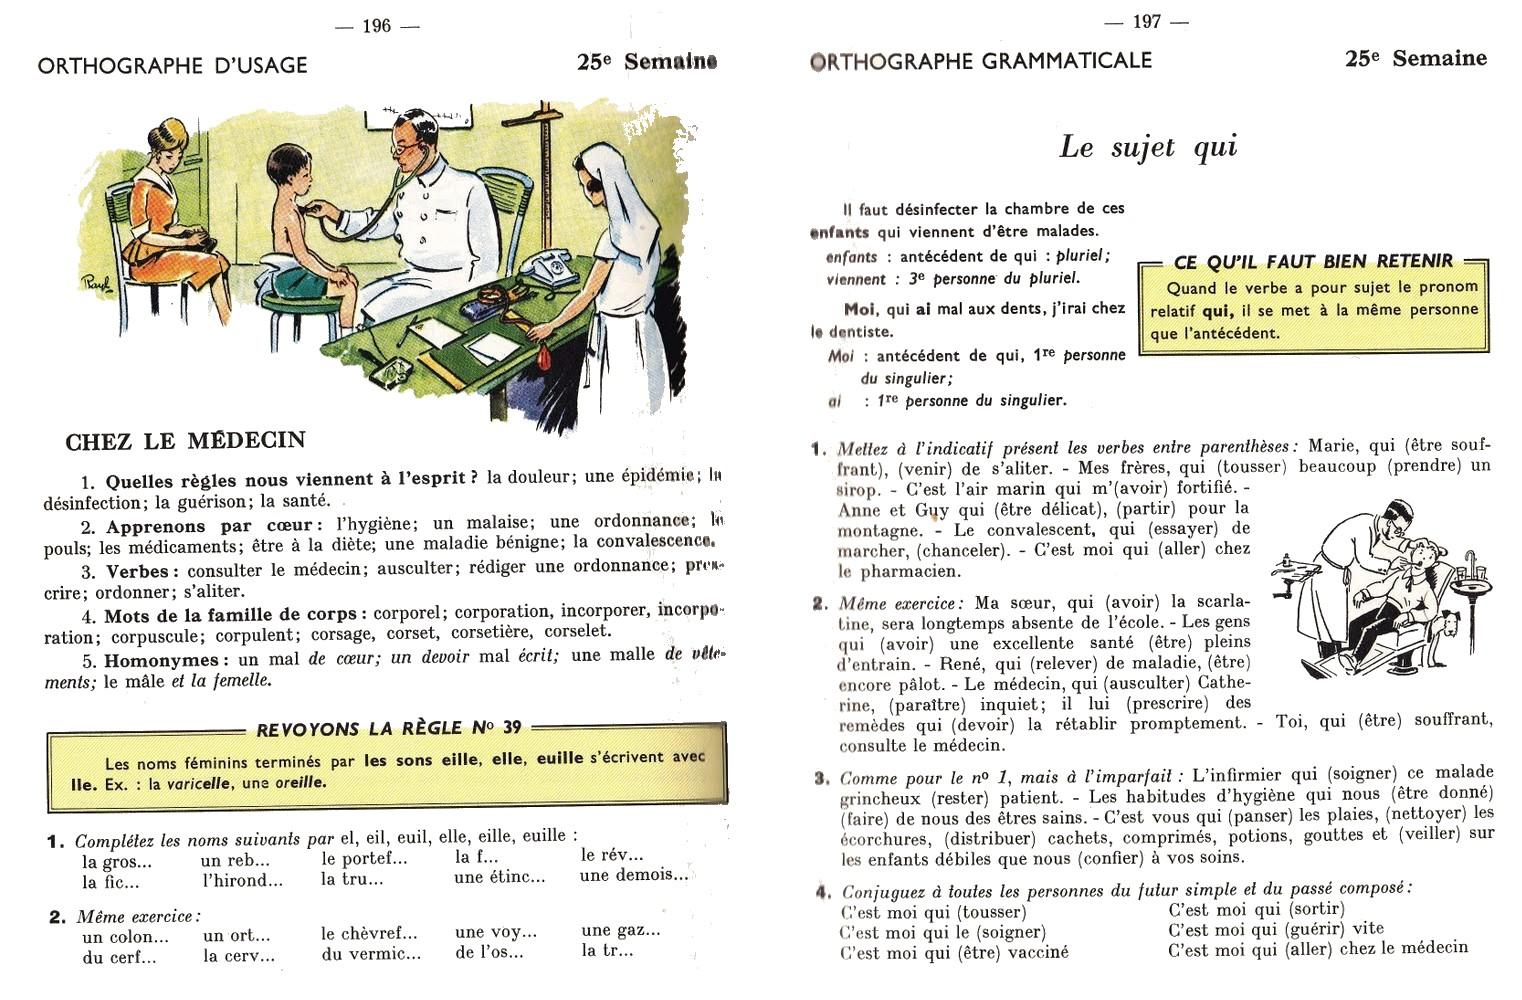 017 Essay Example Berthoucm1196 Essayer Conjugation Breathtaking French Future Verb Past Full